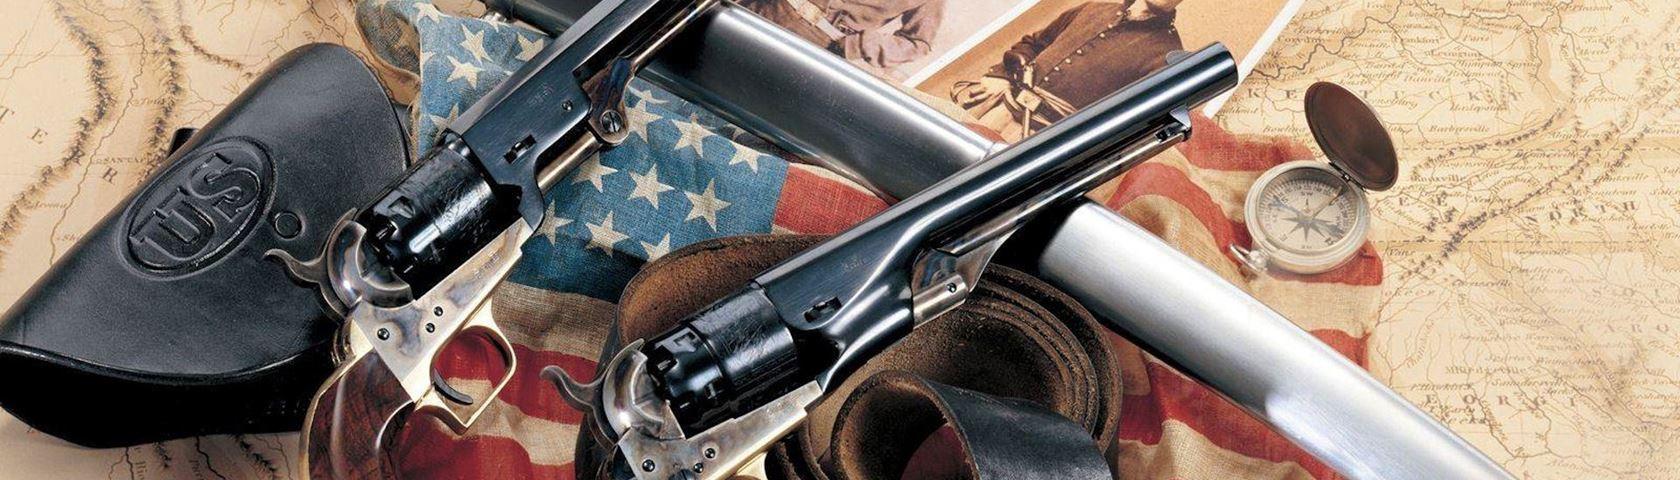 Colt Army Model 1820 Revolver